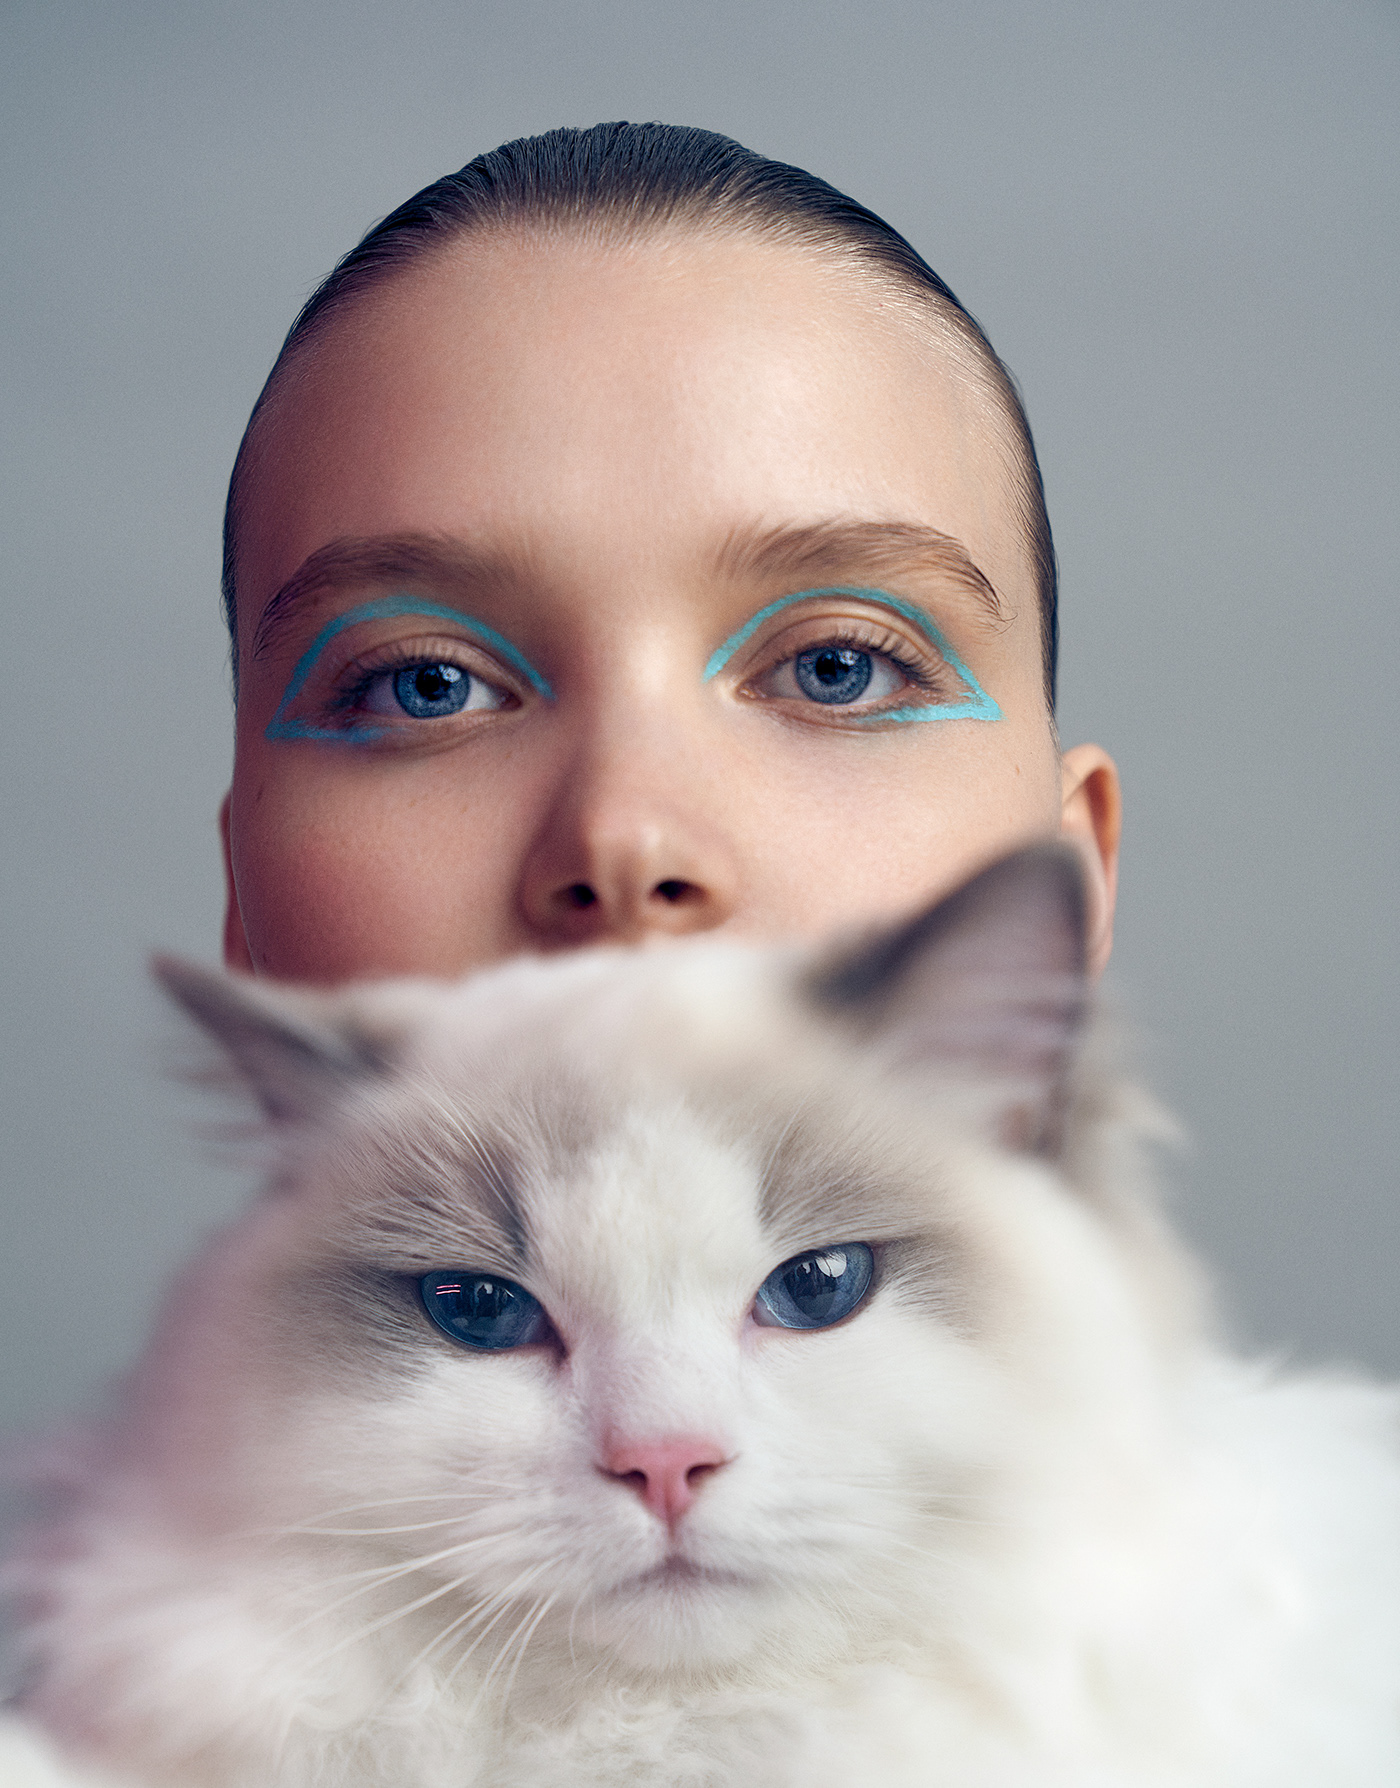 萌宠·美妆|PET&BEAUTY - TGIMAGE STUDIO